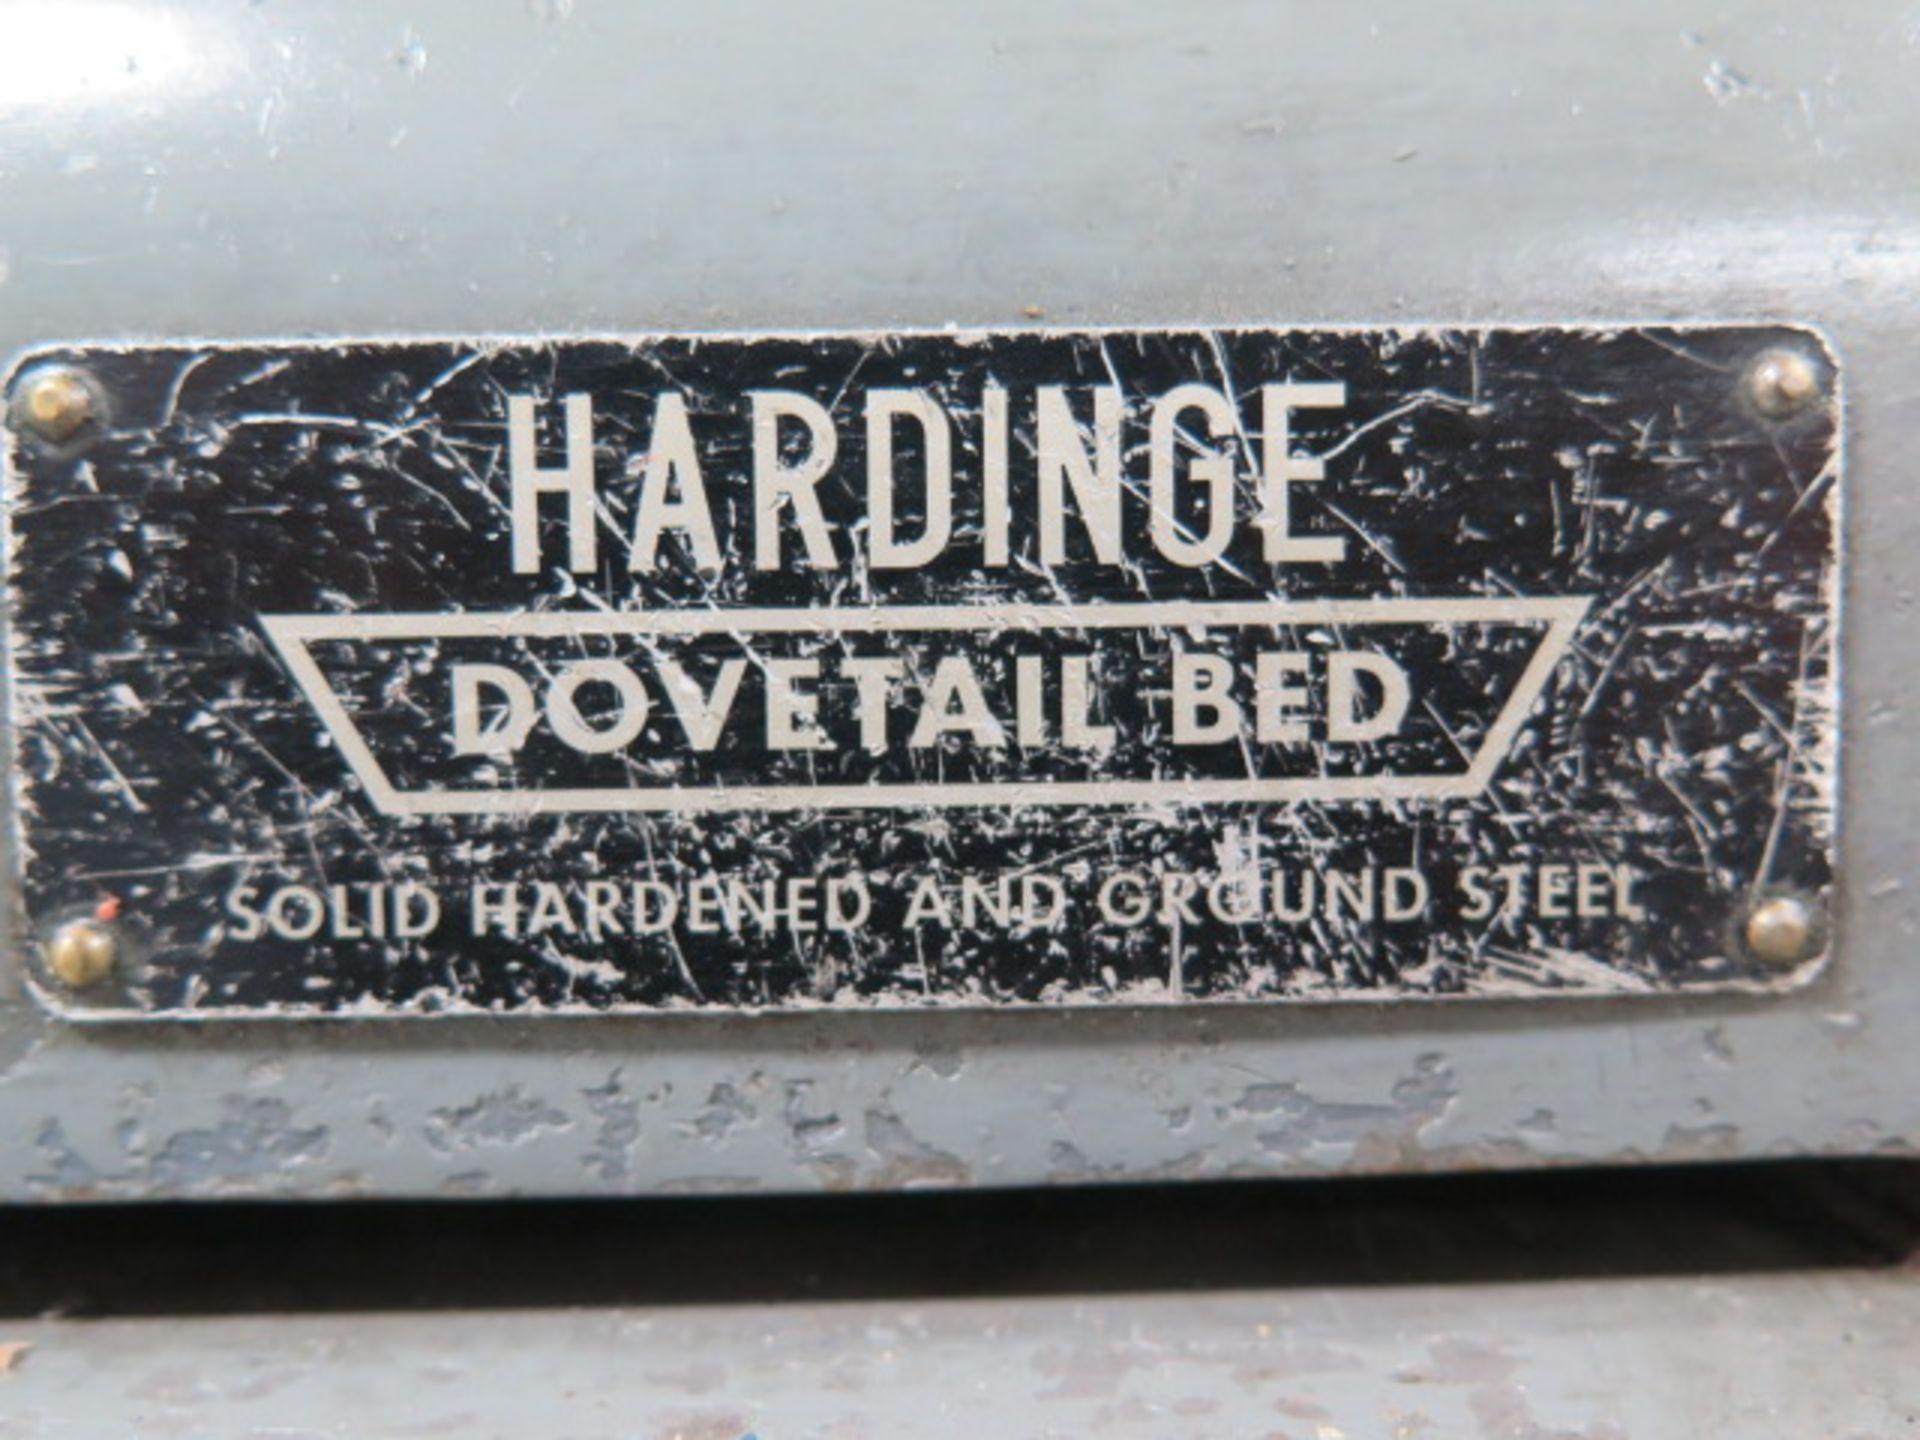 Lot 67 - Hardinge HSL Speed Lathe s/n HSL-5C-2408 w/ 3-Speeds, 5C Collet Closer